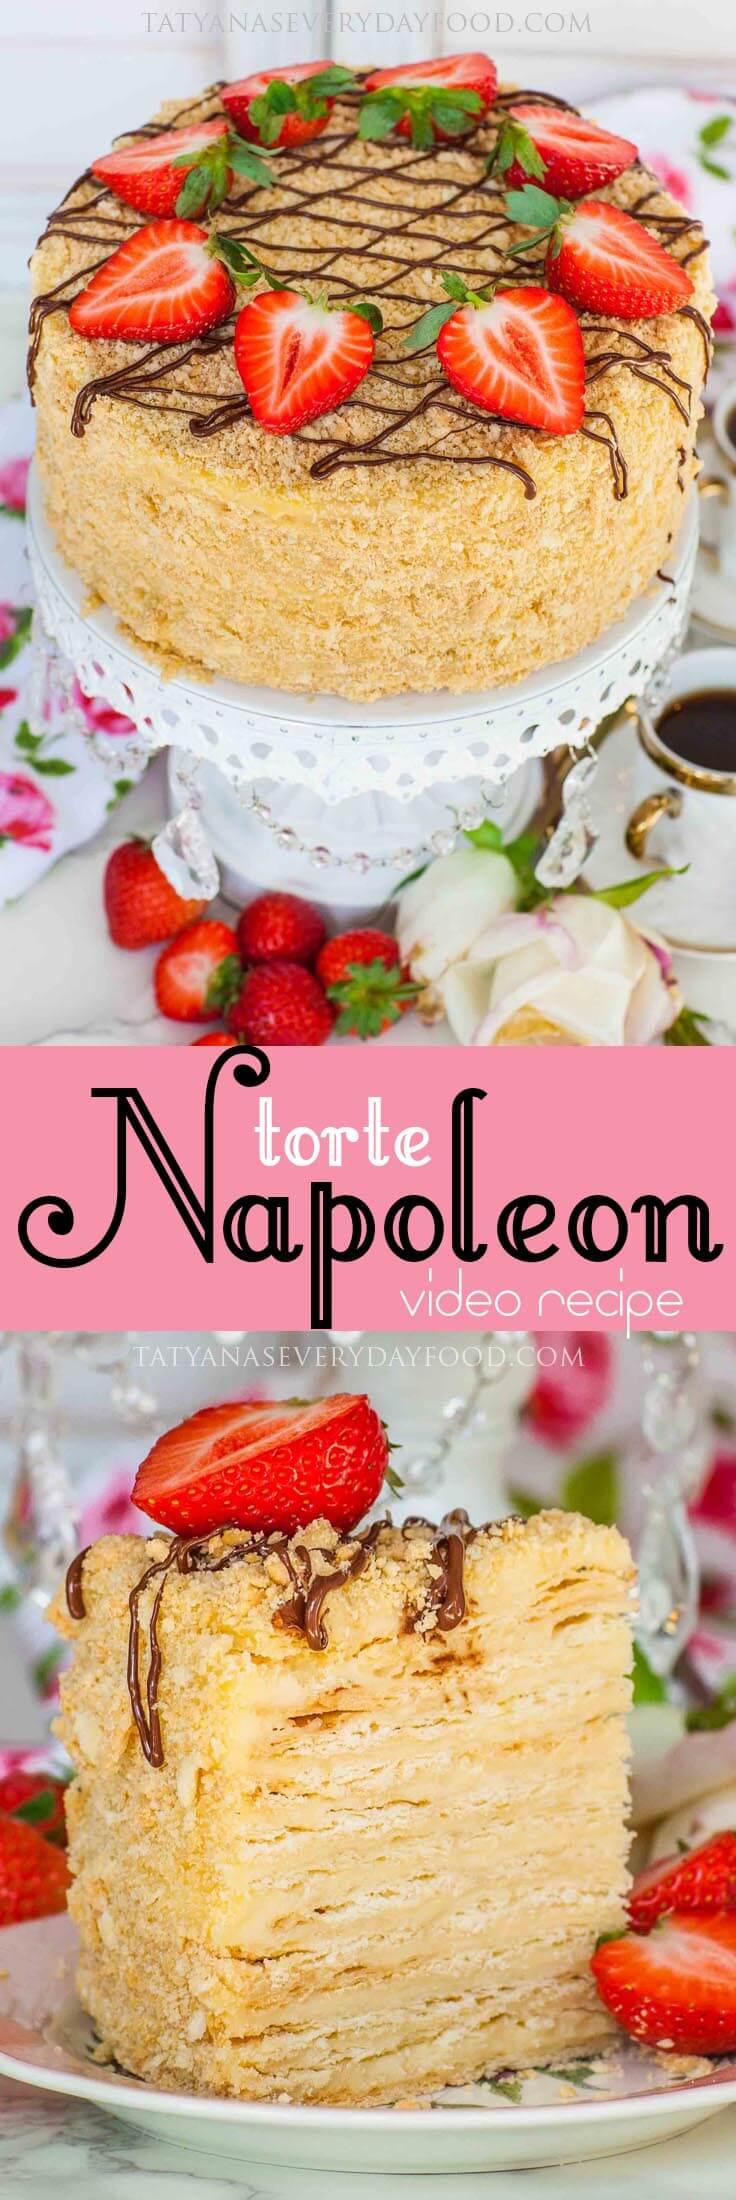 Torte Napoleon video recipe